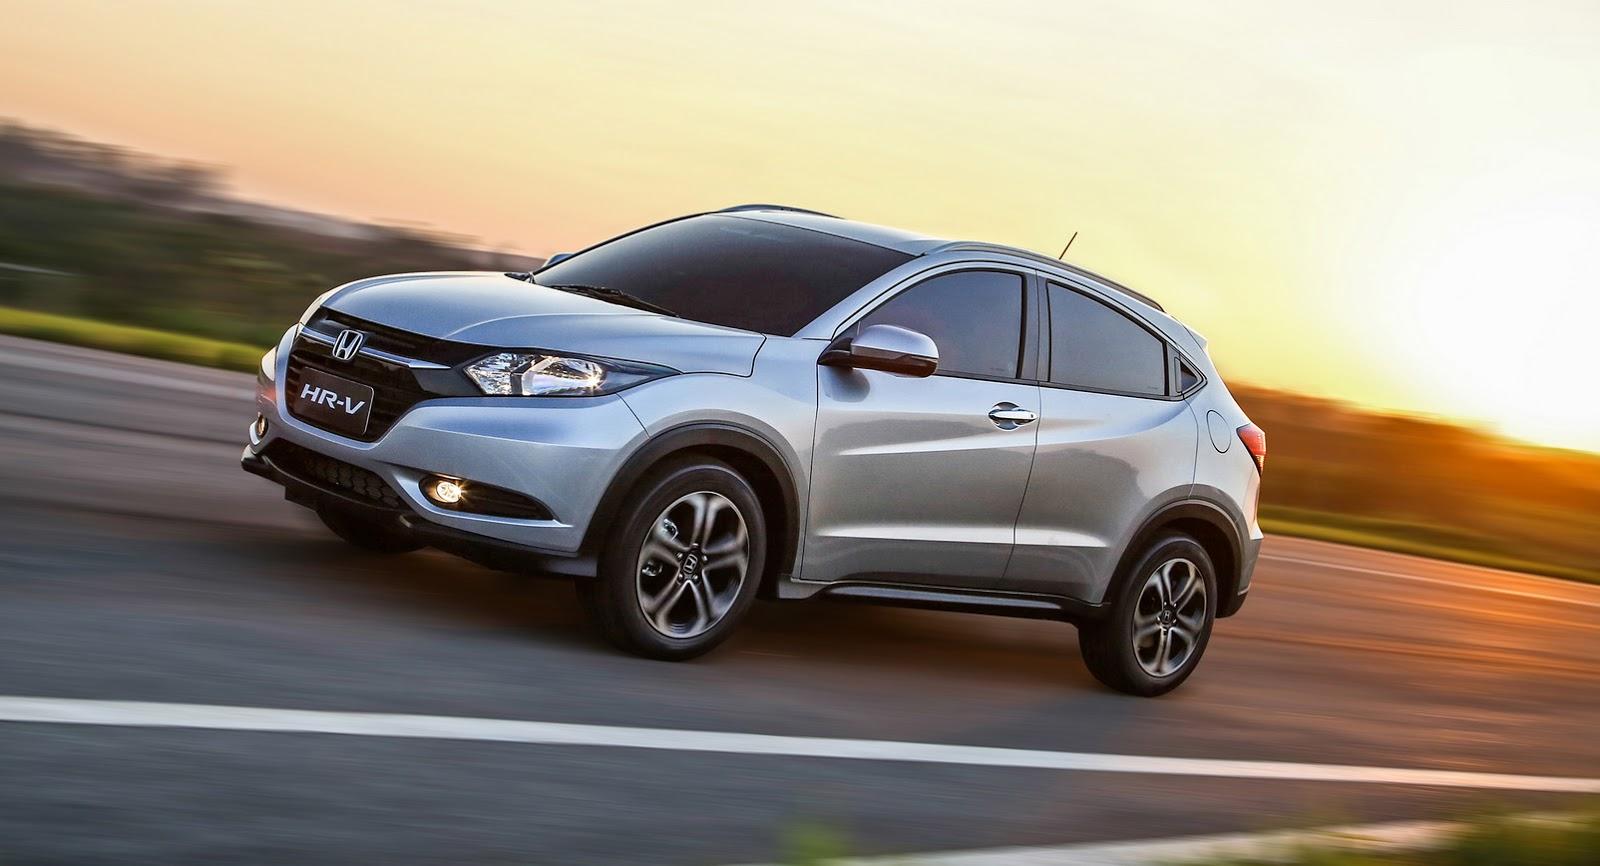 Honda HR-V (Vezel) Gets Watered Down for Brazil Market ...